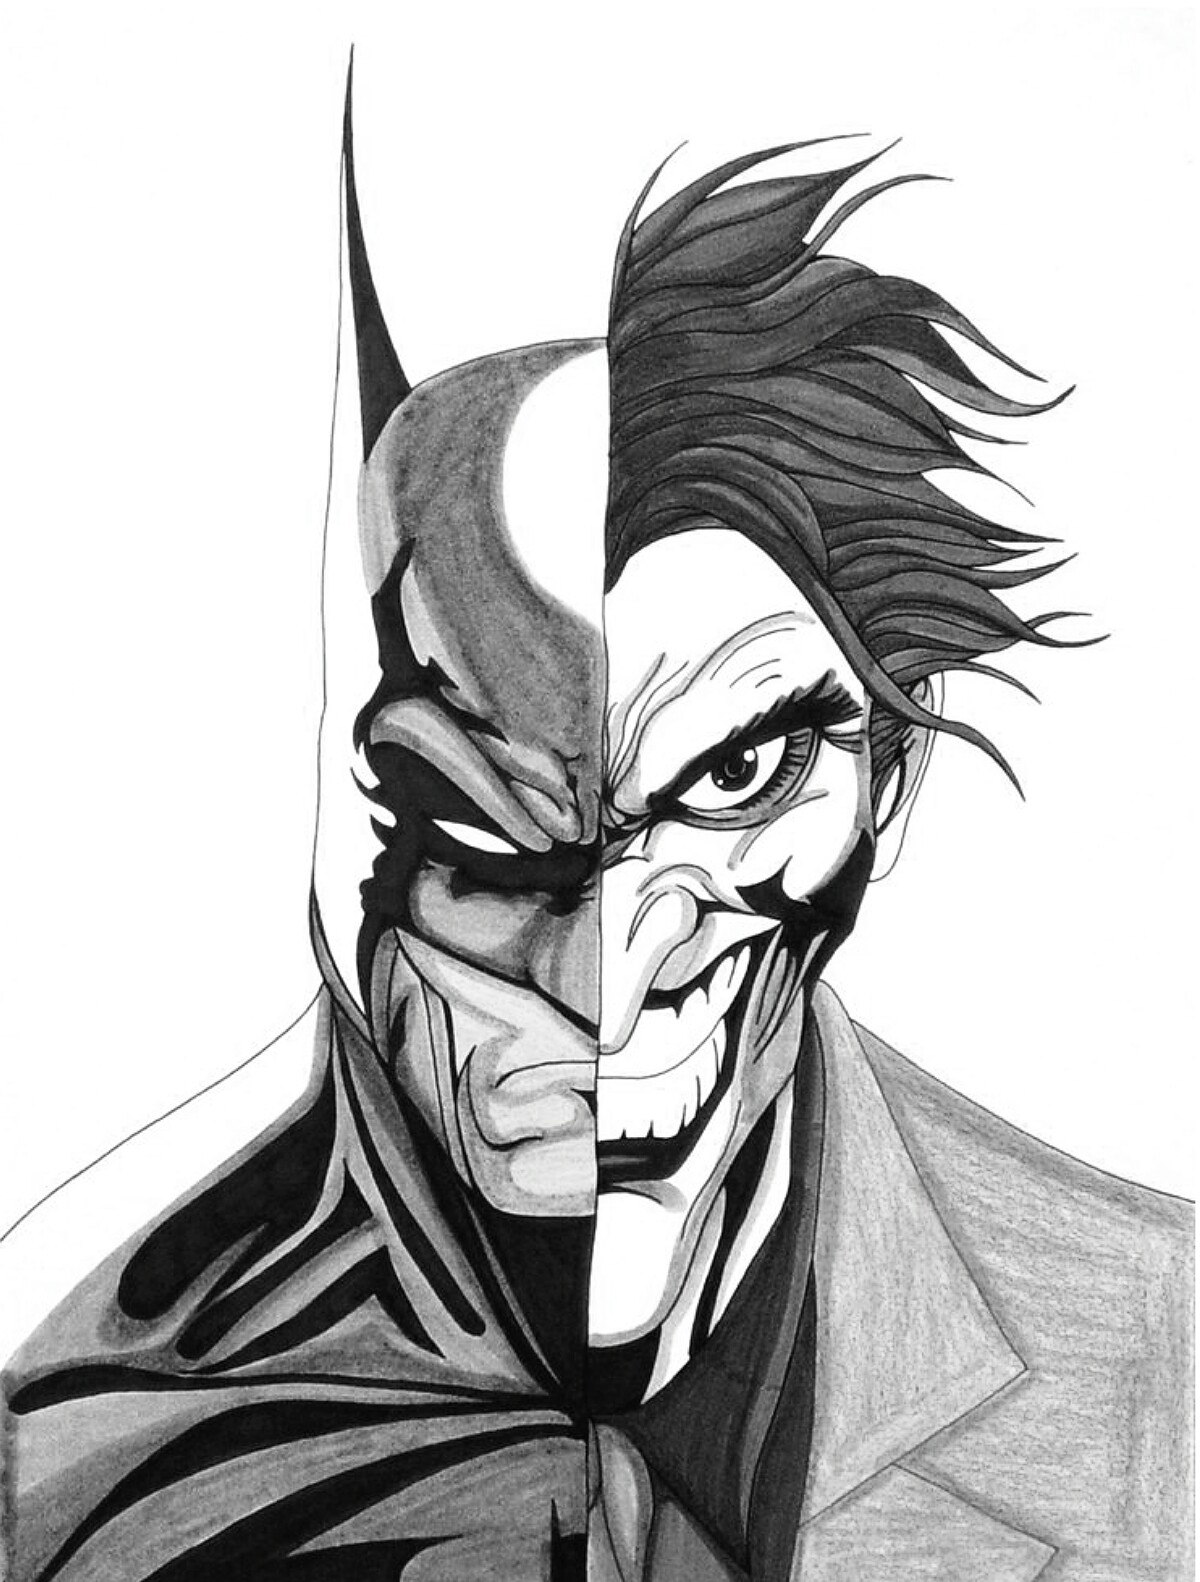 1200x1582 Half Batman, Half Joker The Joker Joker, Batman